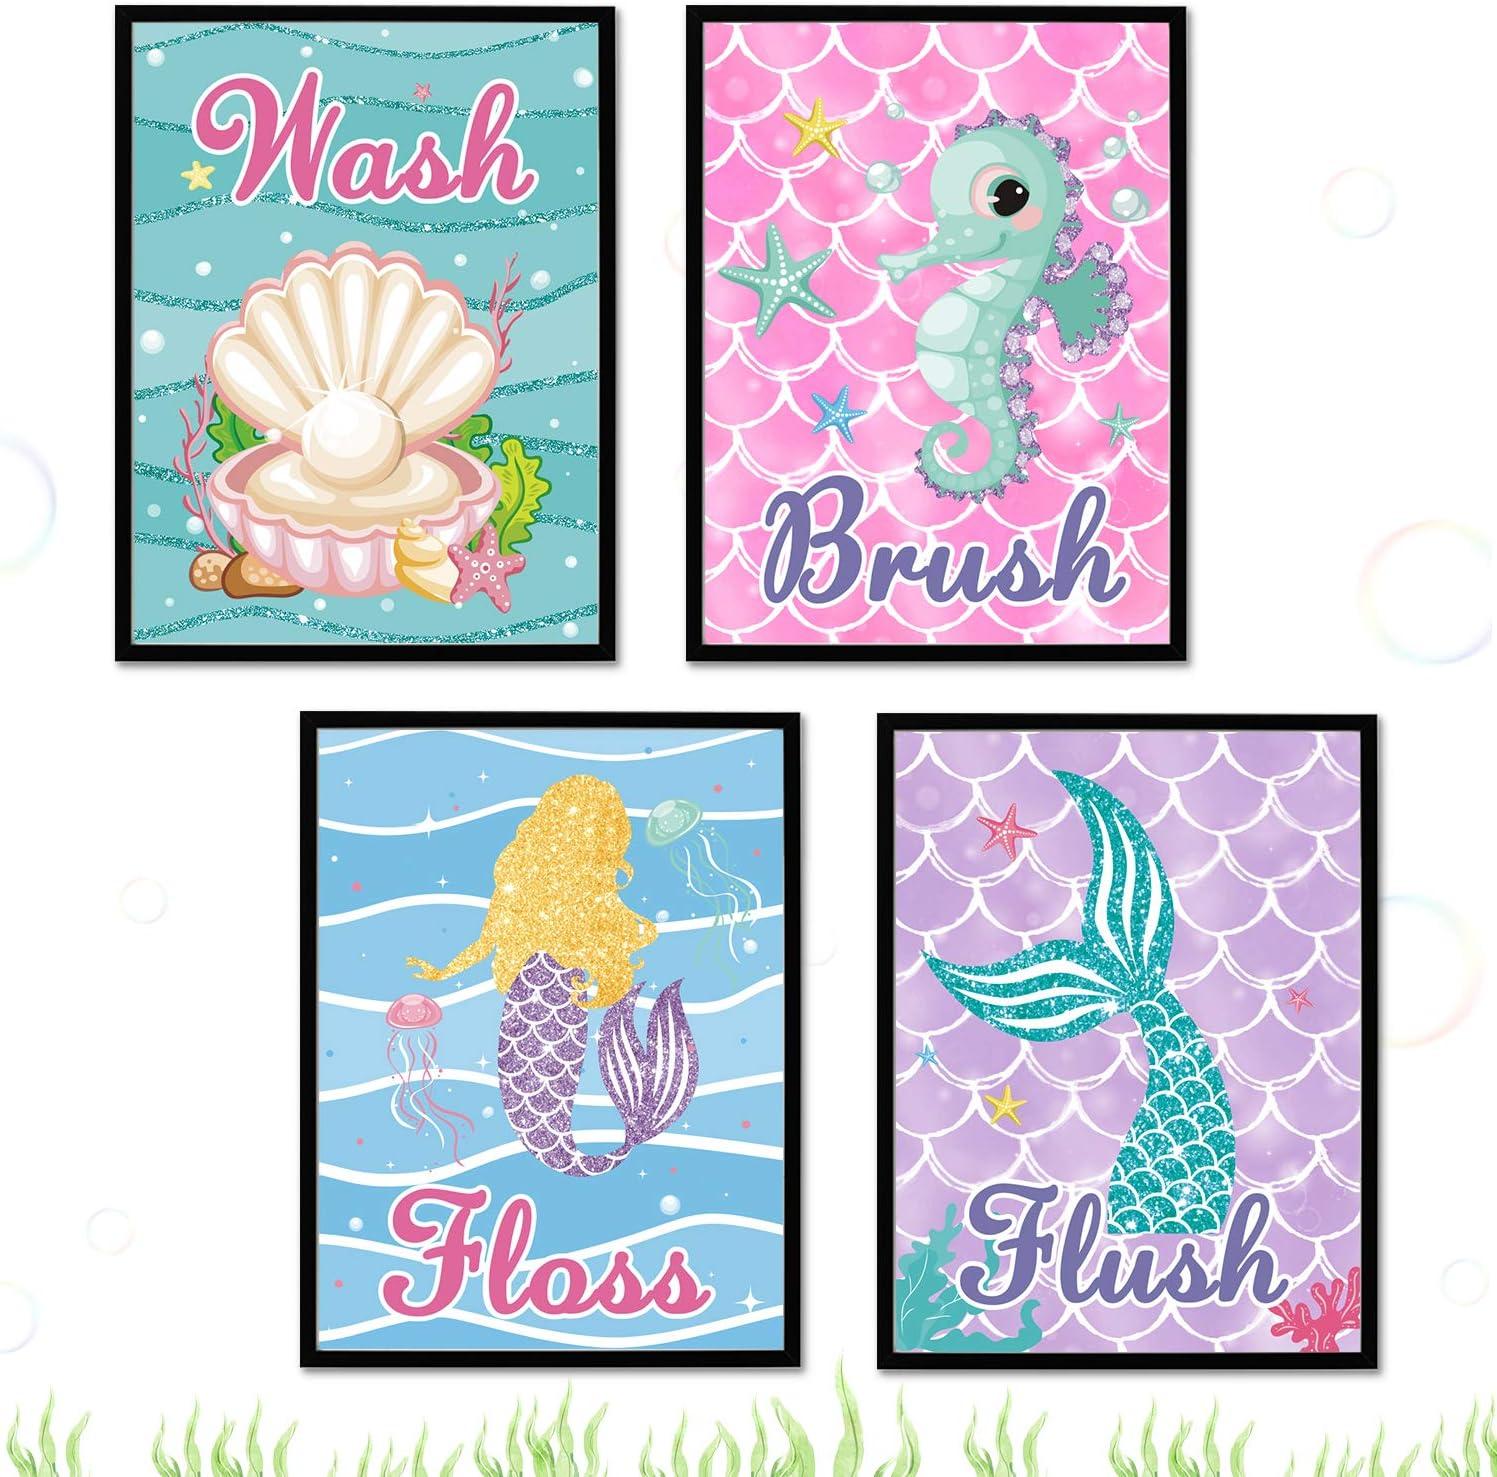 Mermaid Bathroom Wall Art Decors, Ocean Wash Brush Floss Flush Kids Girls Bathroom Under the Sea Rules Wall Signs with Frames, Set of 4